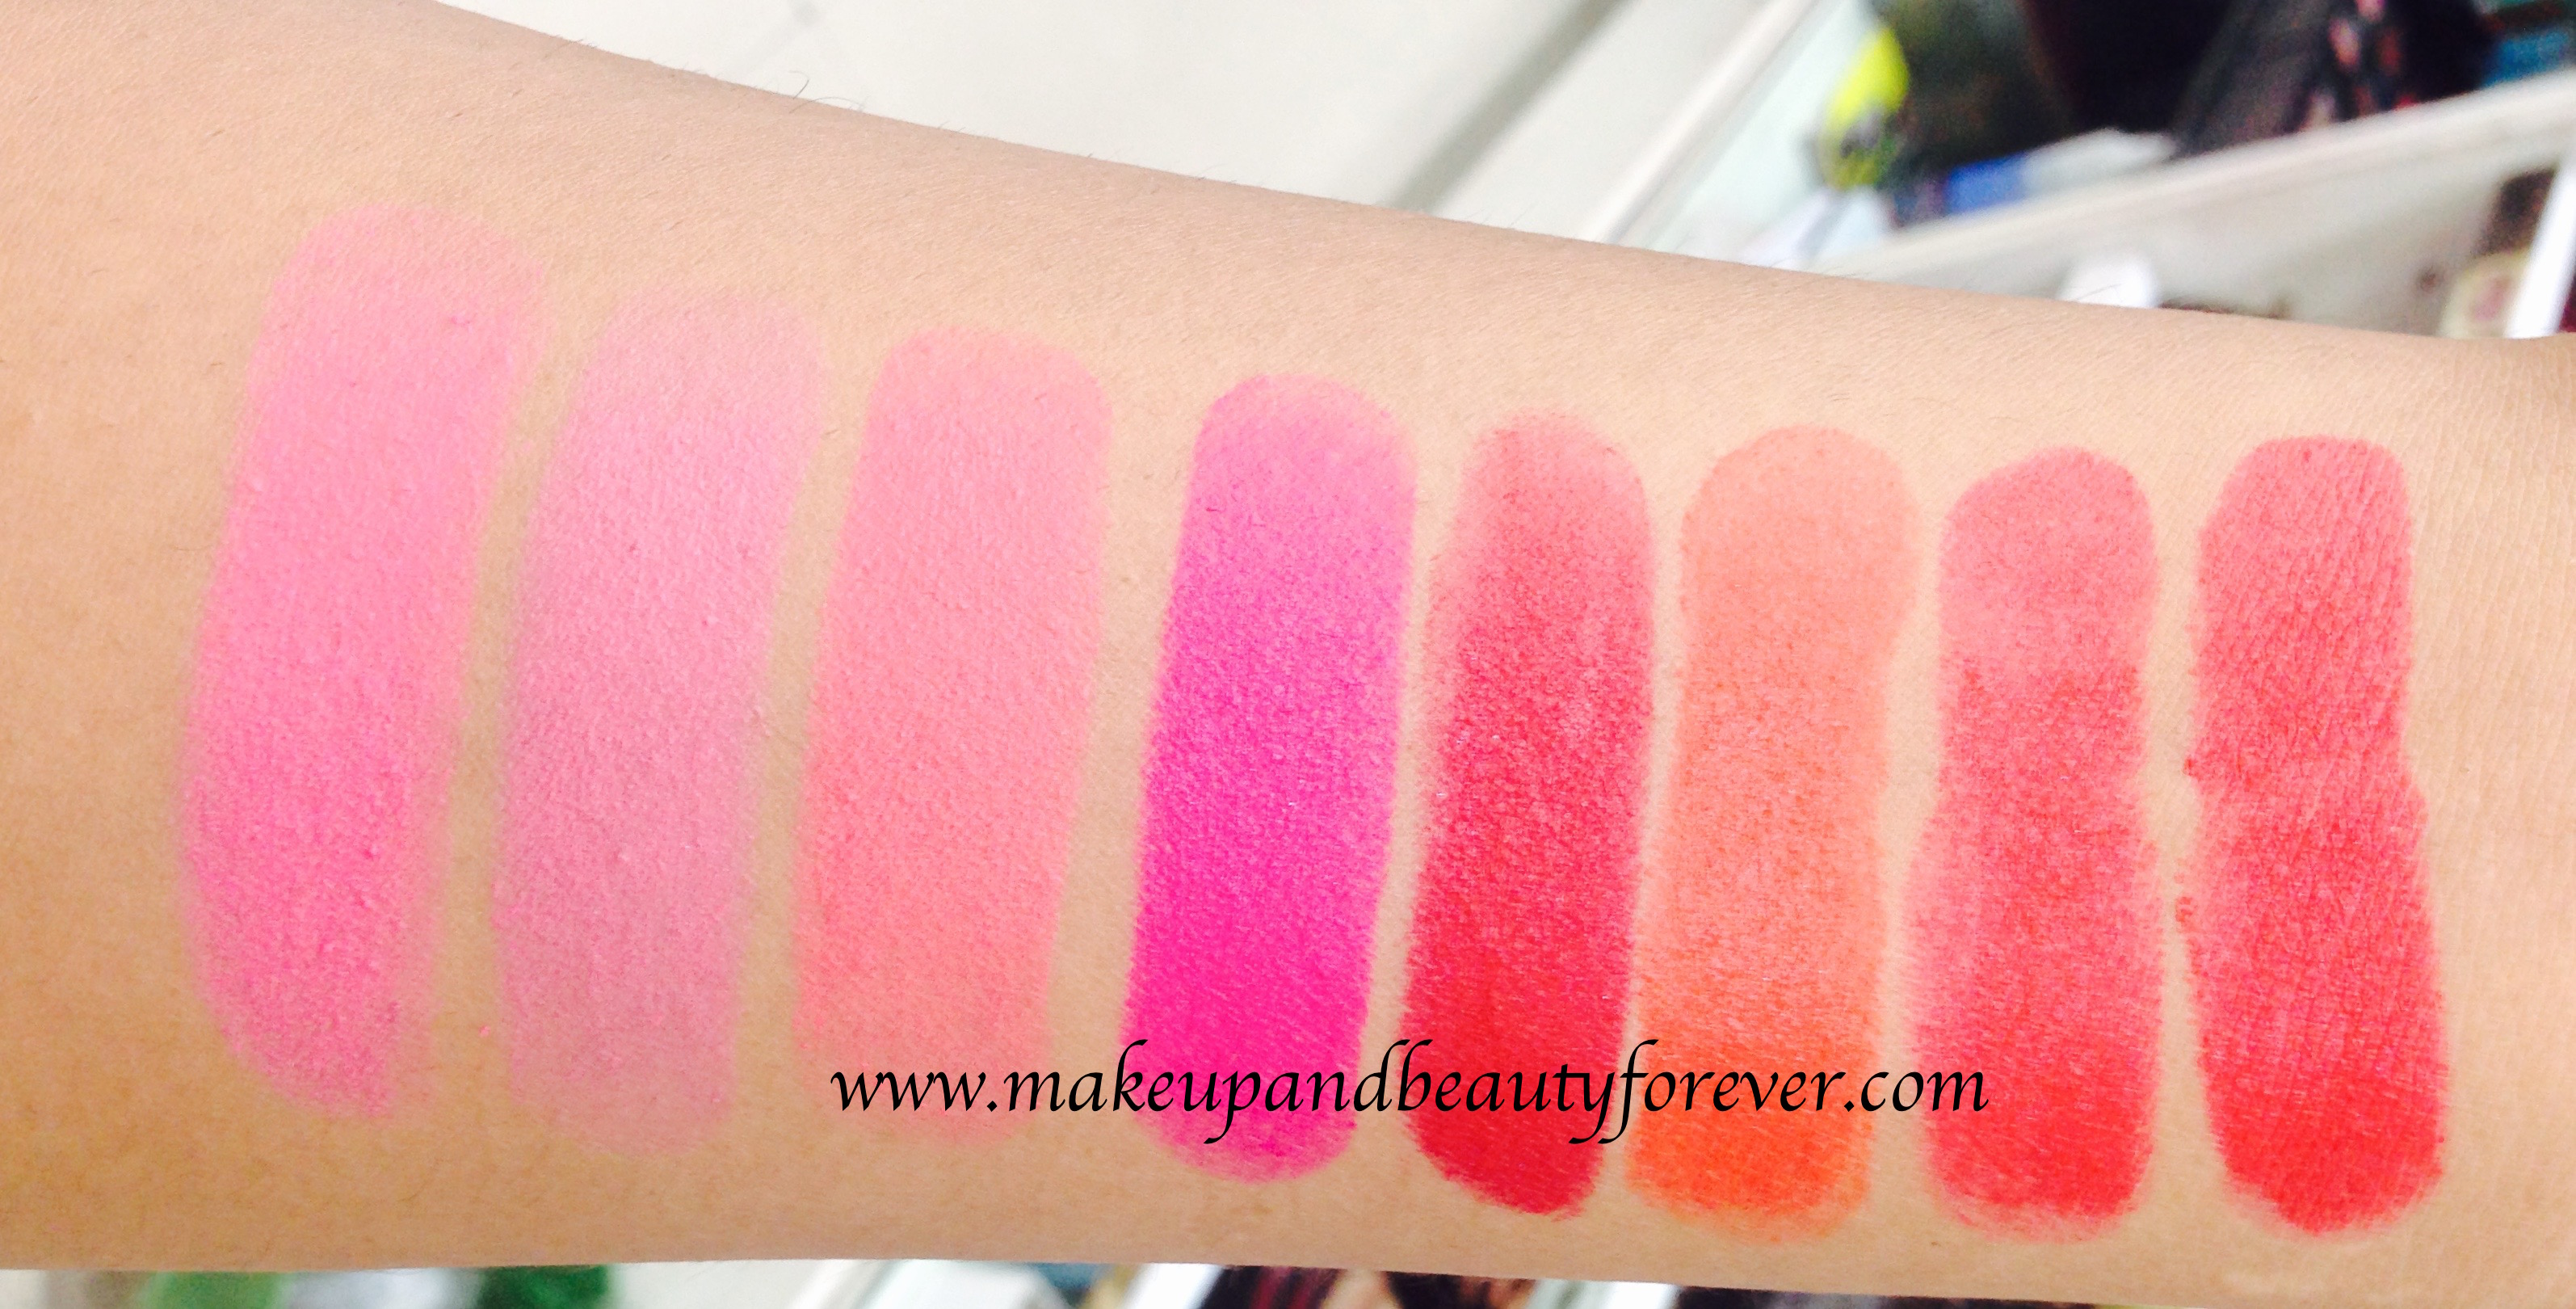 Maybelline Color Show Fuchsia Lipstick Review